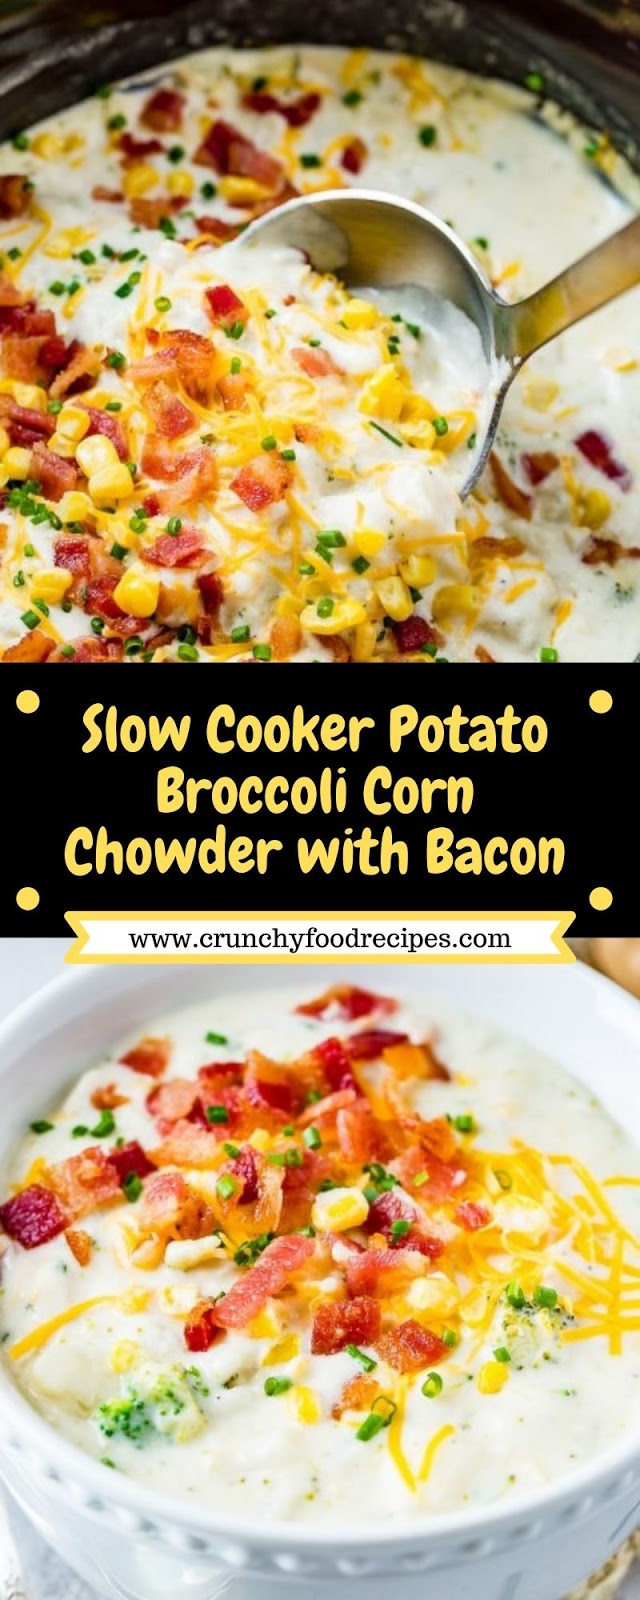 Slow Cooker Potato Broccoli Corn Chowder with Bacon